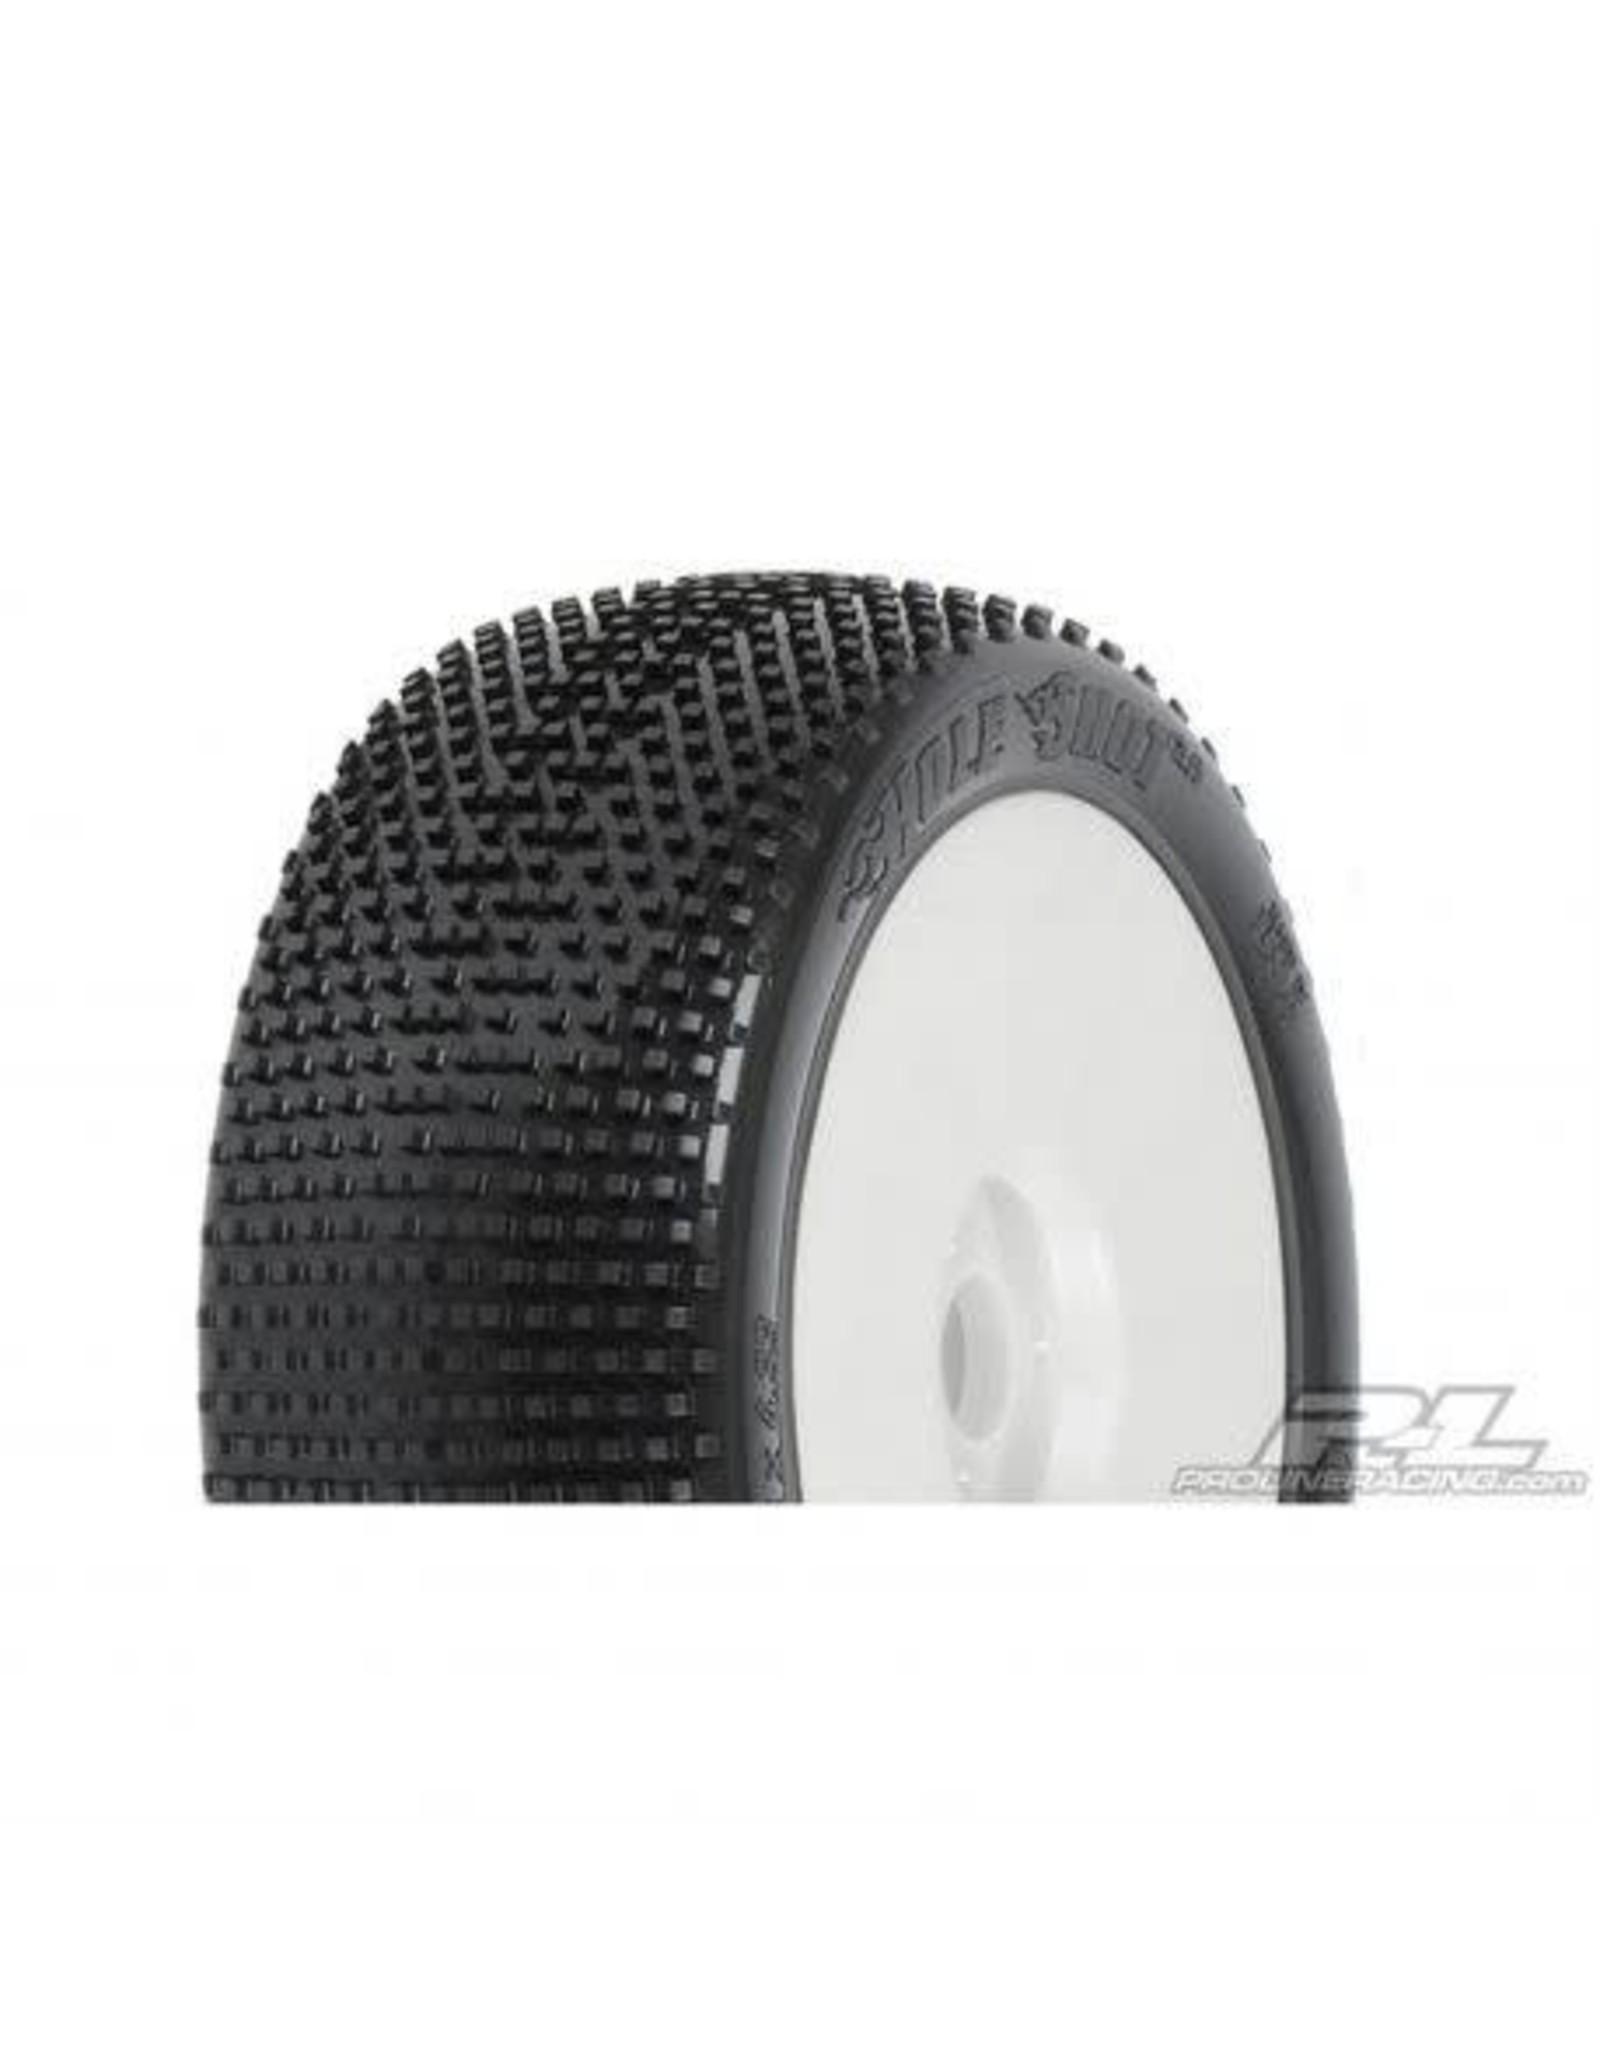 Pro-Line Racing 1/8 Holeshot X3 Mnt LTWT Velocity Wheel, White: BX